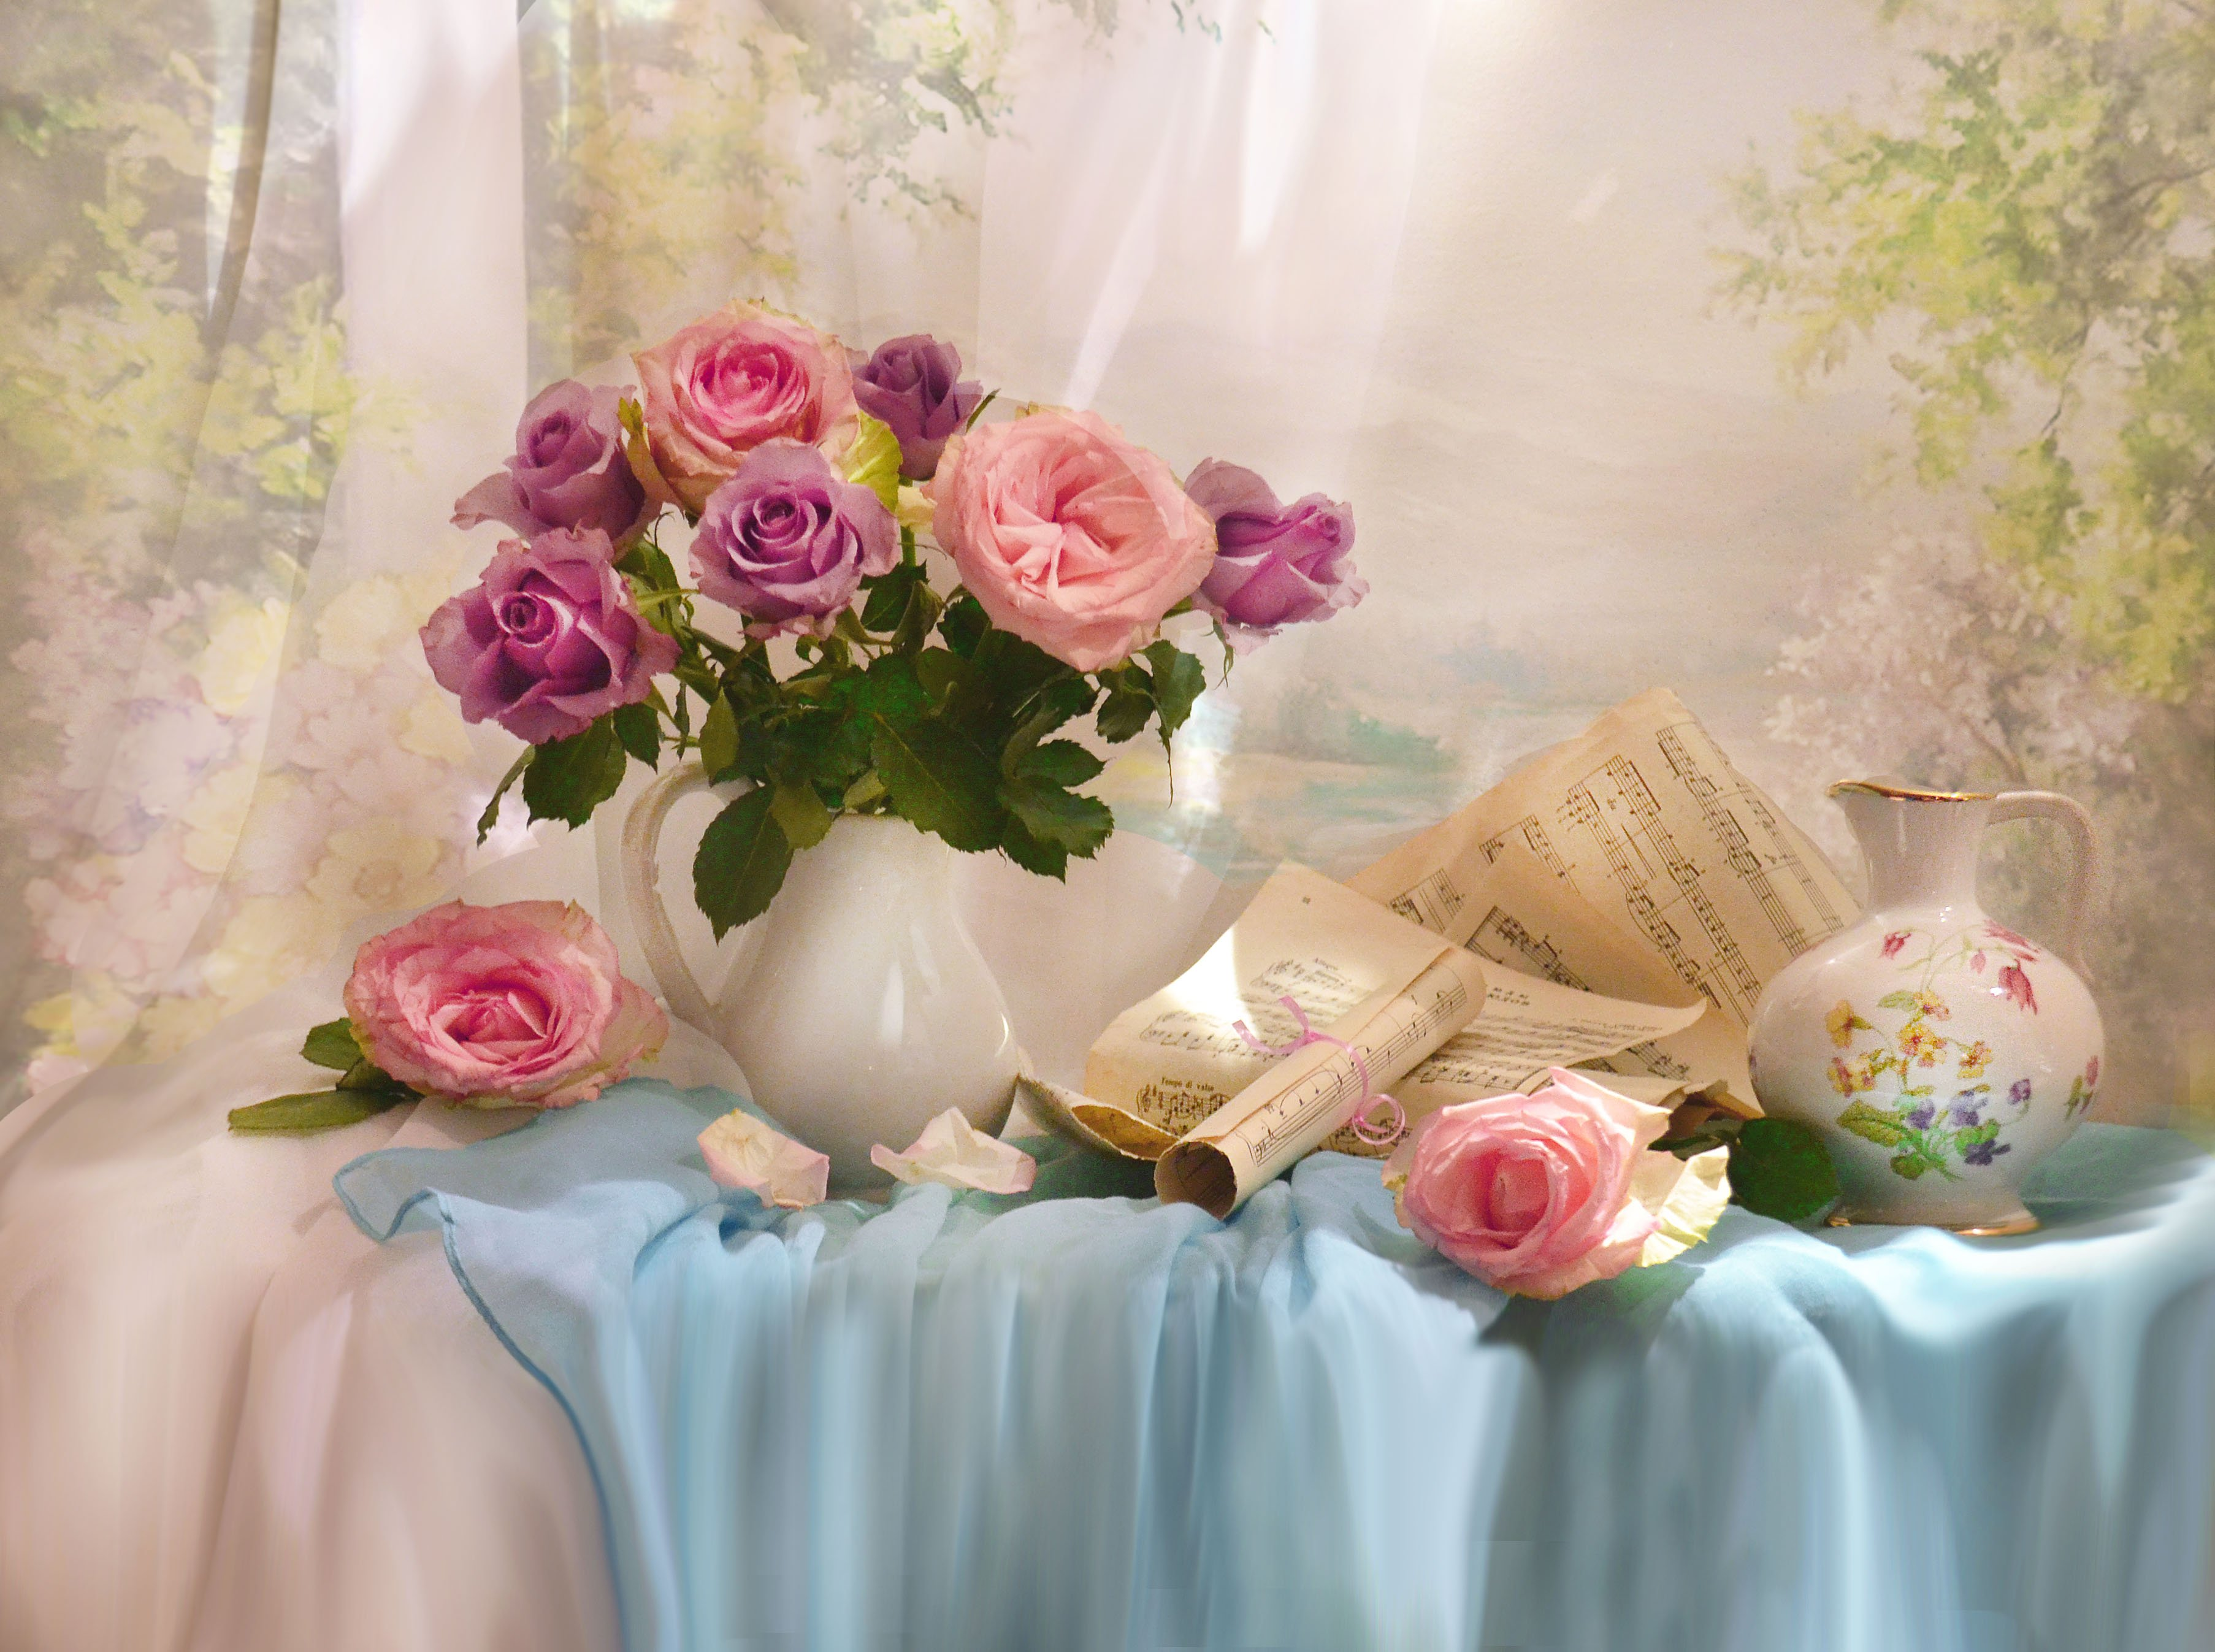 still life, натюрморт ,  весна,    розы,  стихи, фото натюрморт, цветы, ноты, фарфор, кувшин, Колова Валентина